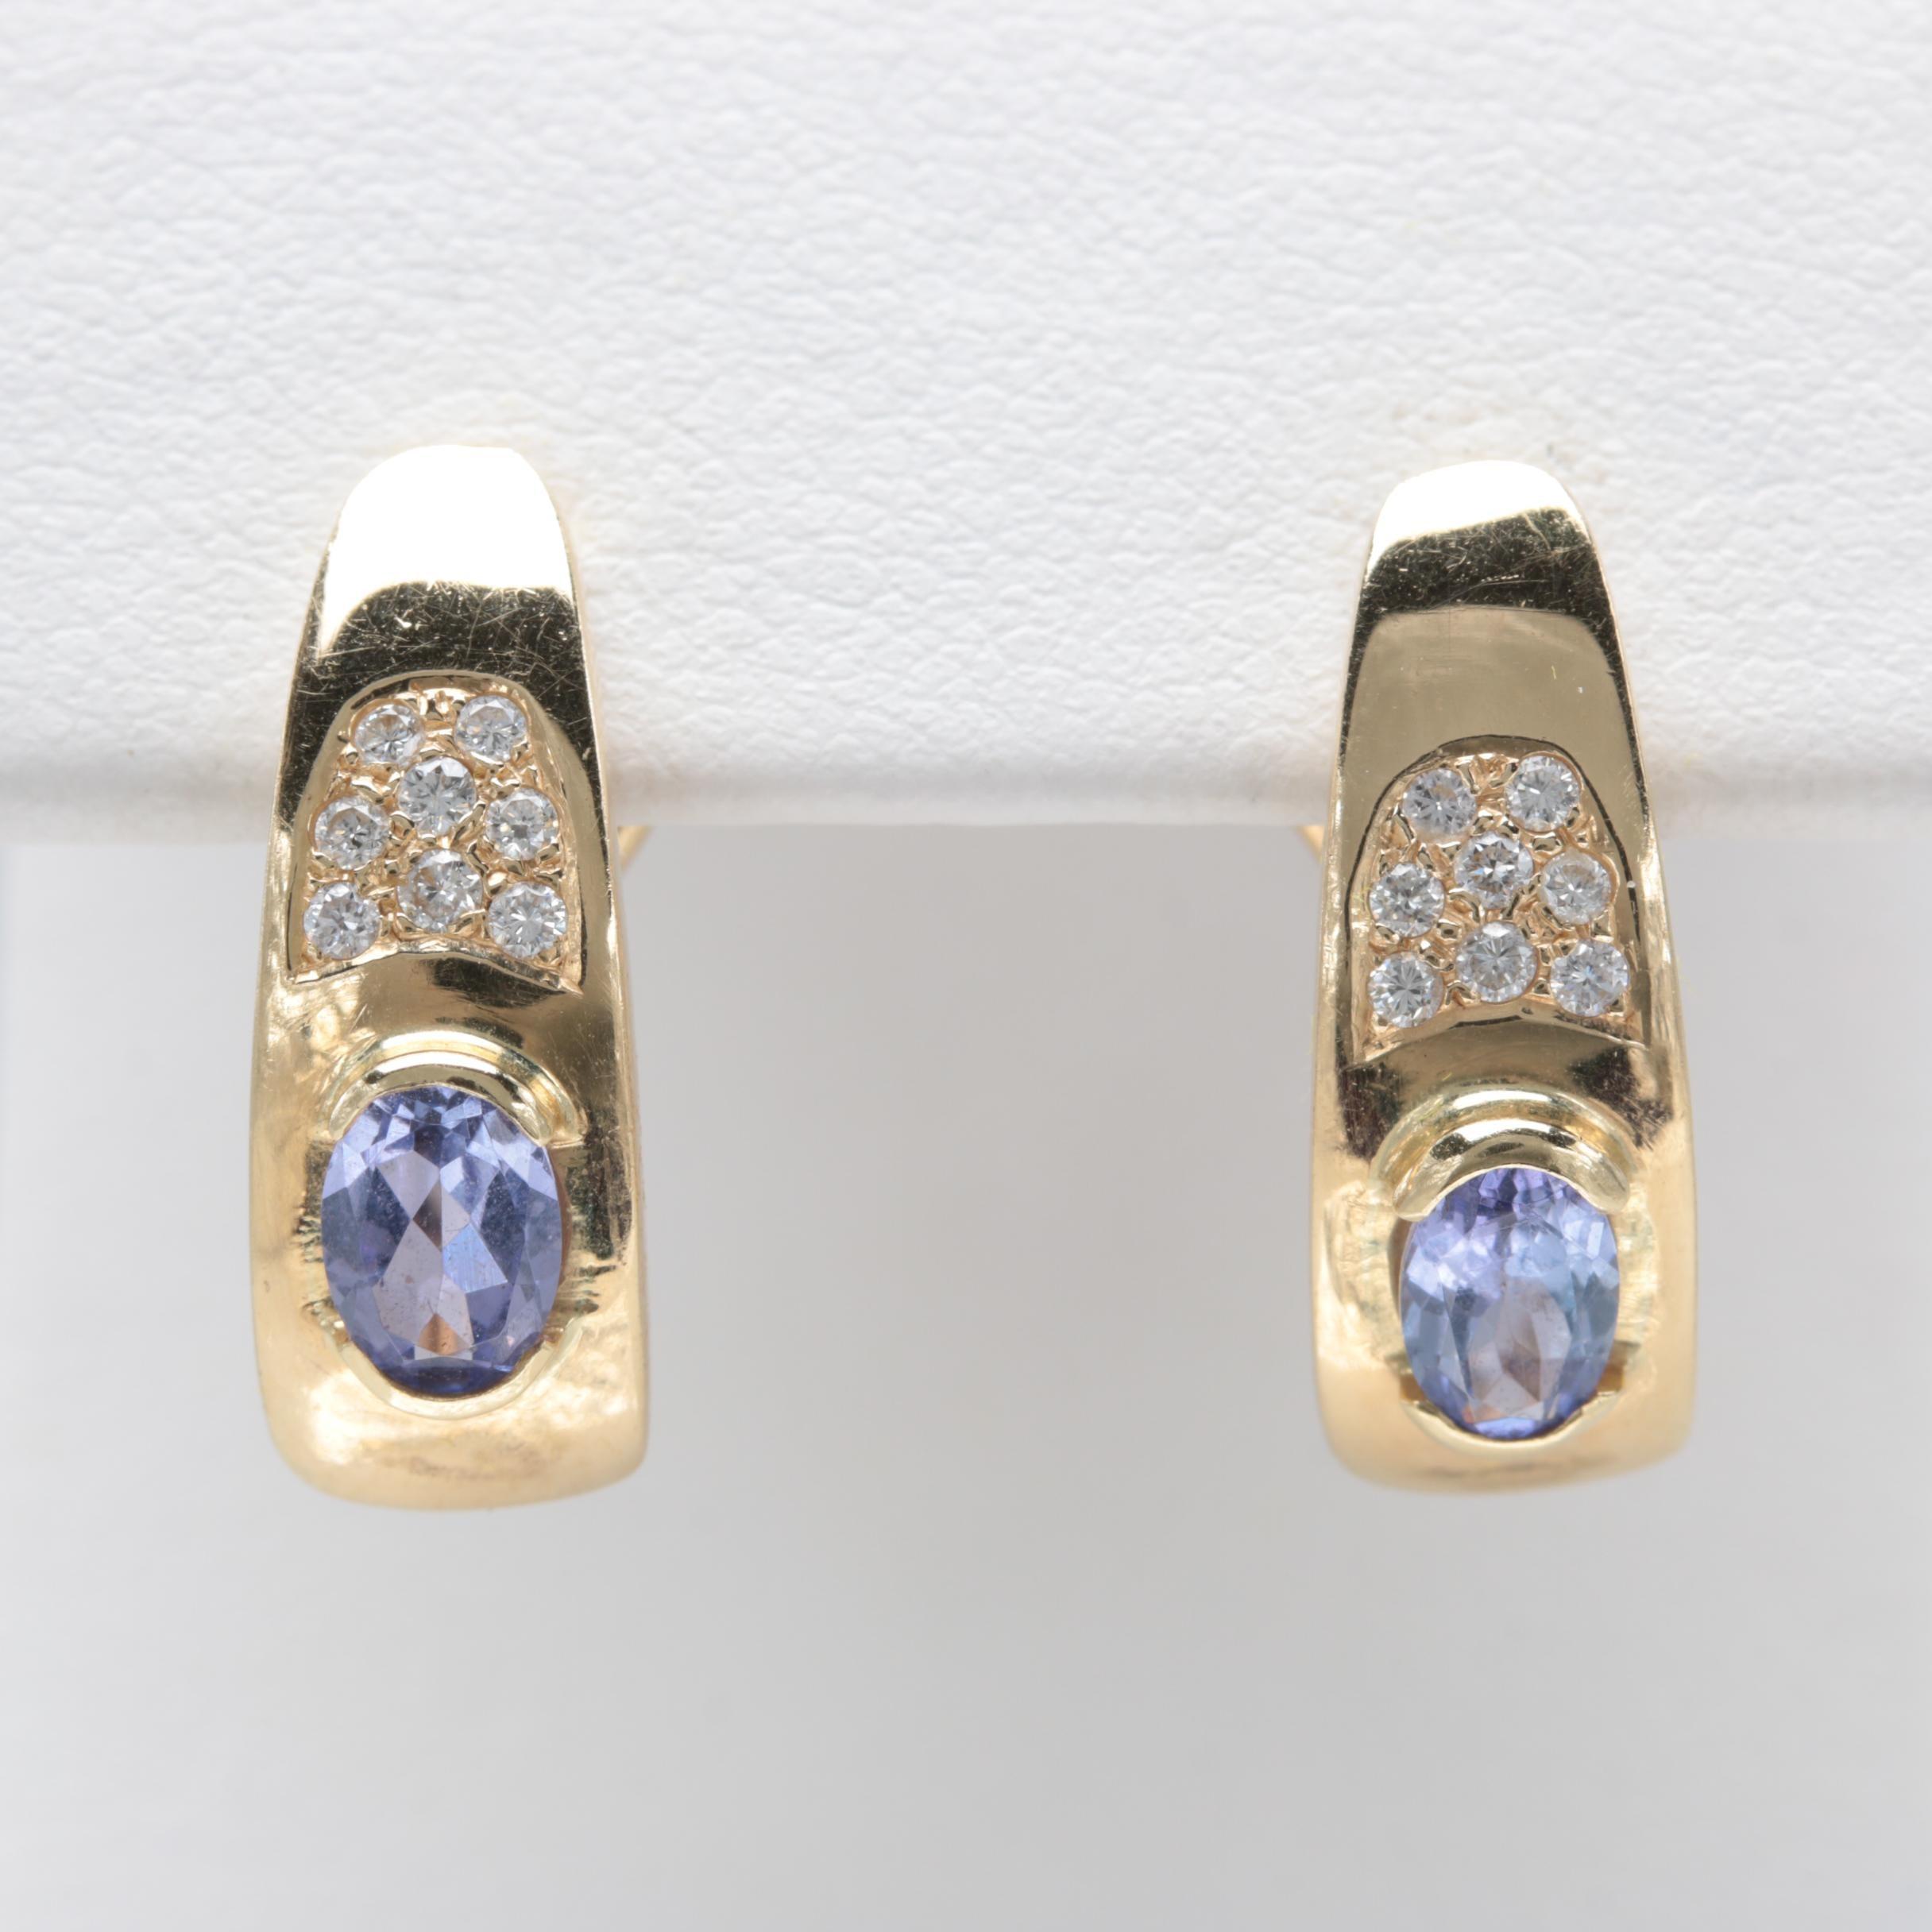 18K Yellow Gold Tanzanite and Diamond Earrings